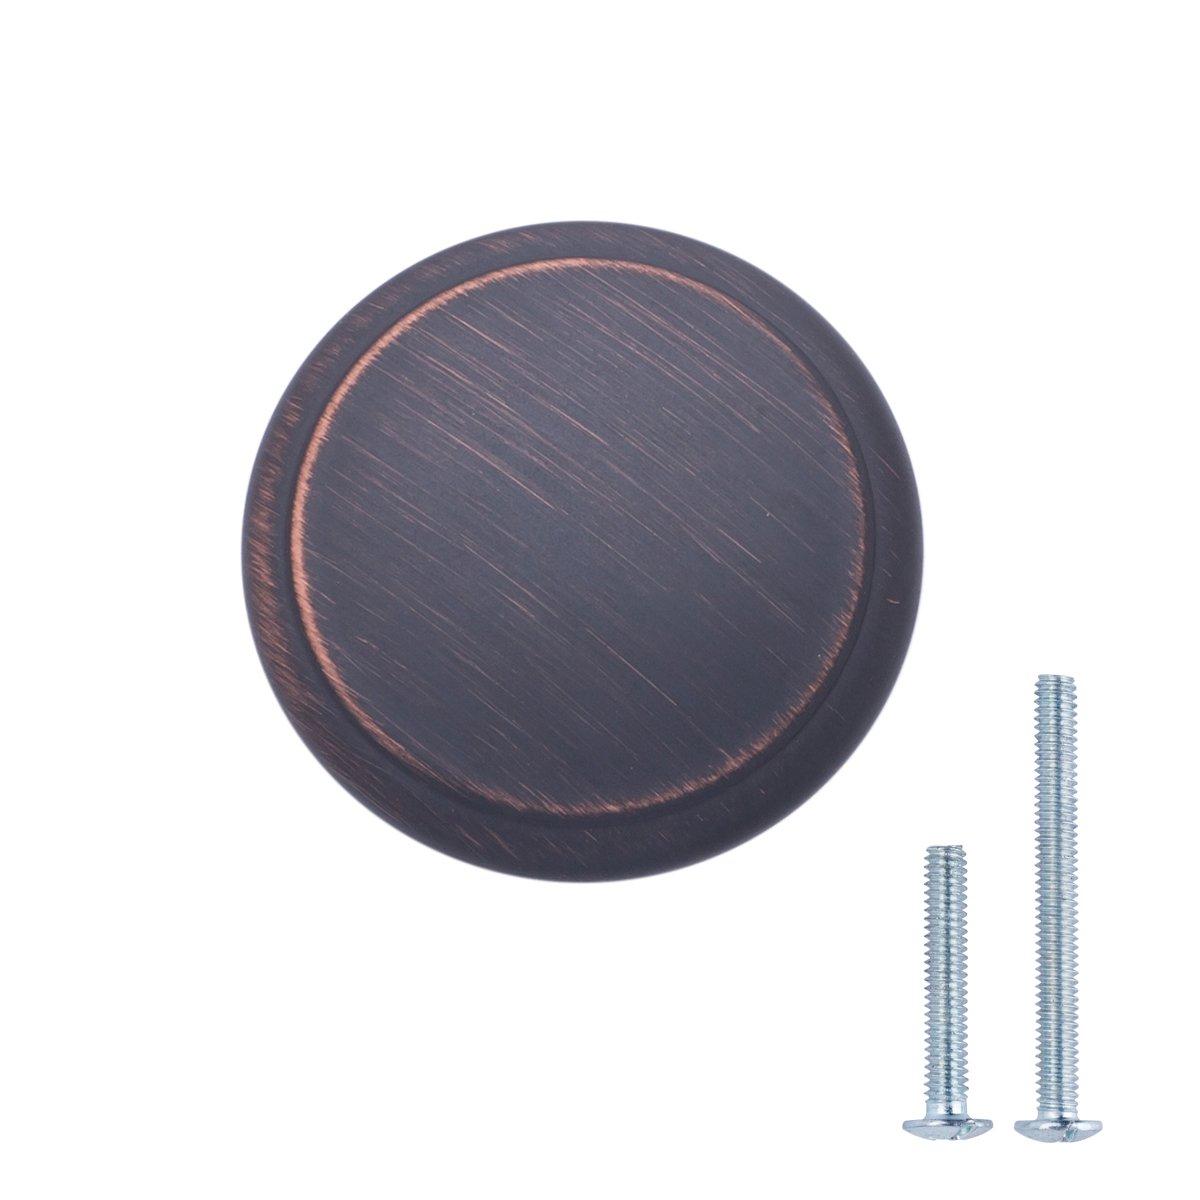 AmazonBasics Modern Top Ring Cabinet Knob, 1.16'' Diameter, Oil Rubbed Bronze, 25-Pack